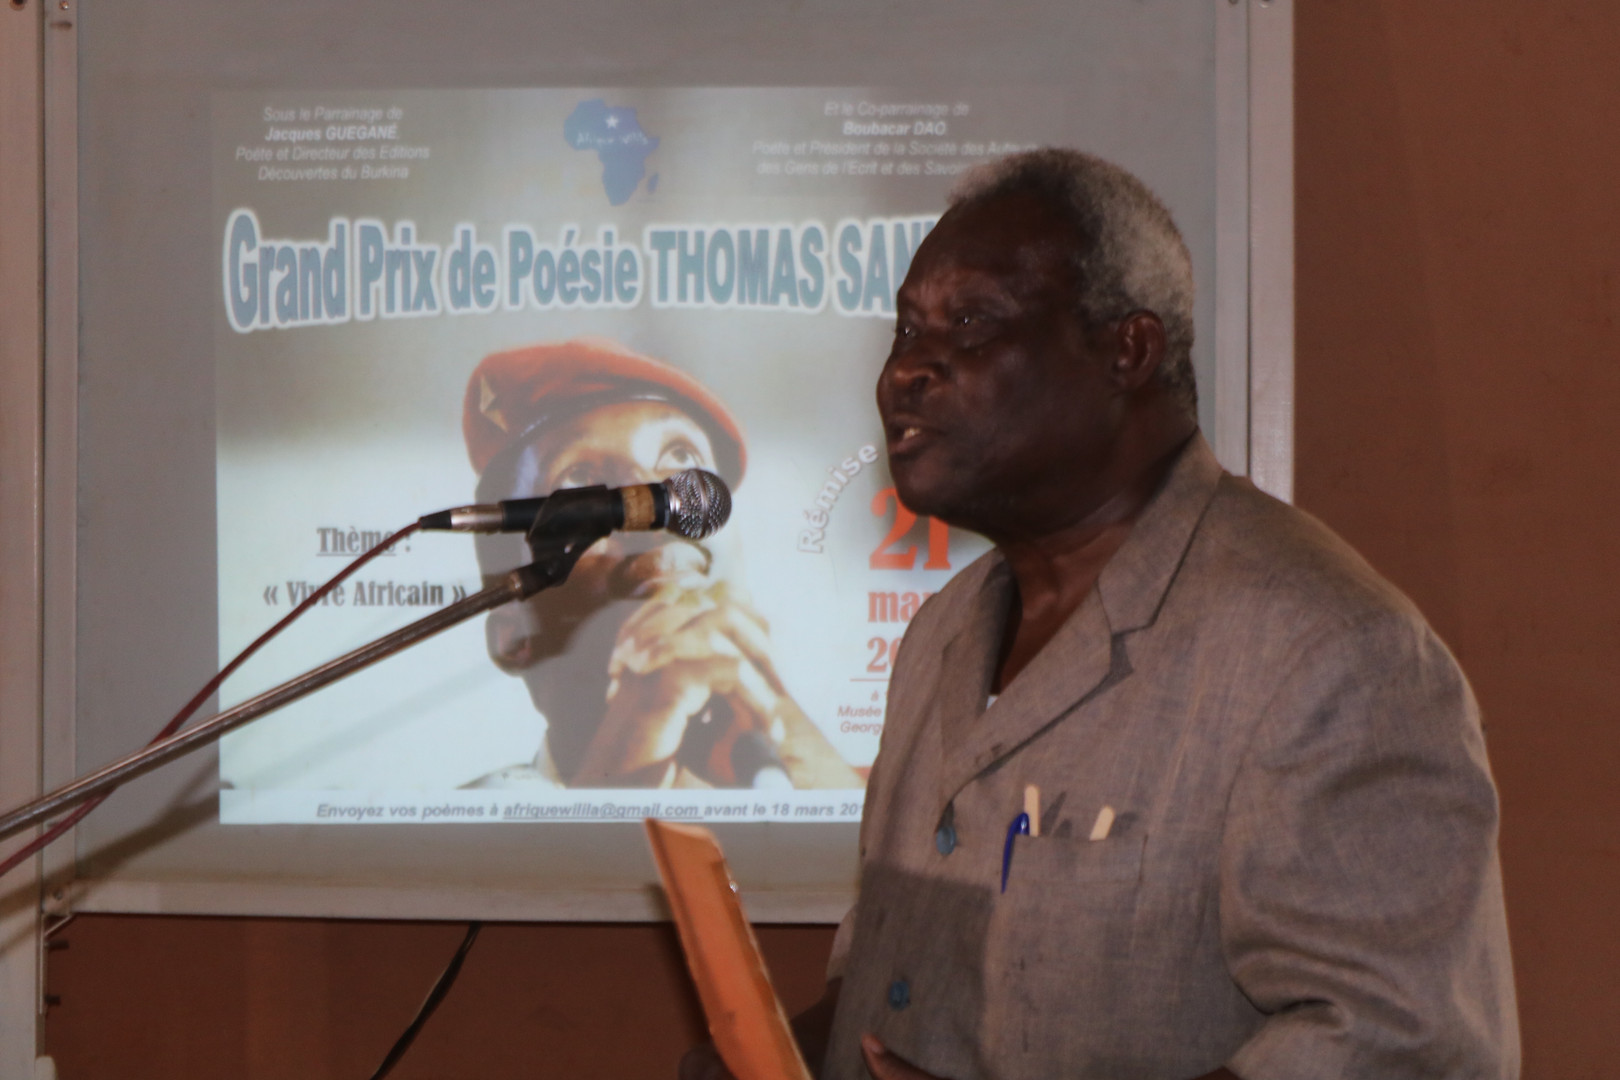 Grand_Prix_de_Poésie_Thomas_Sankara_(6).